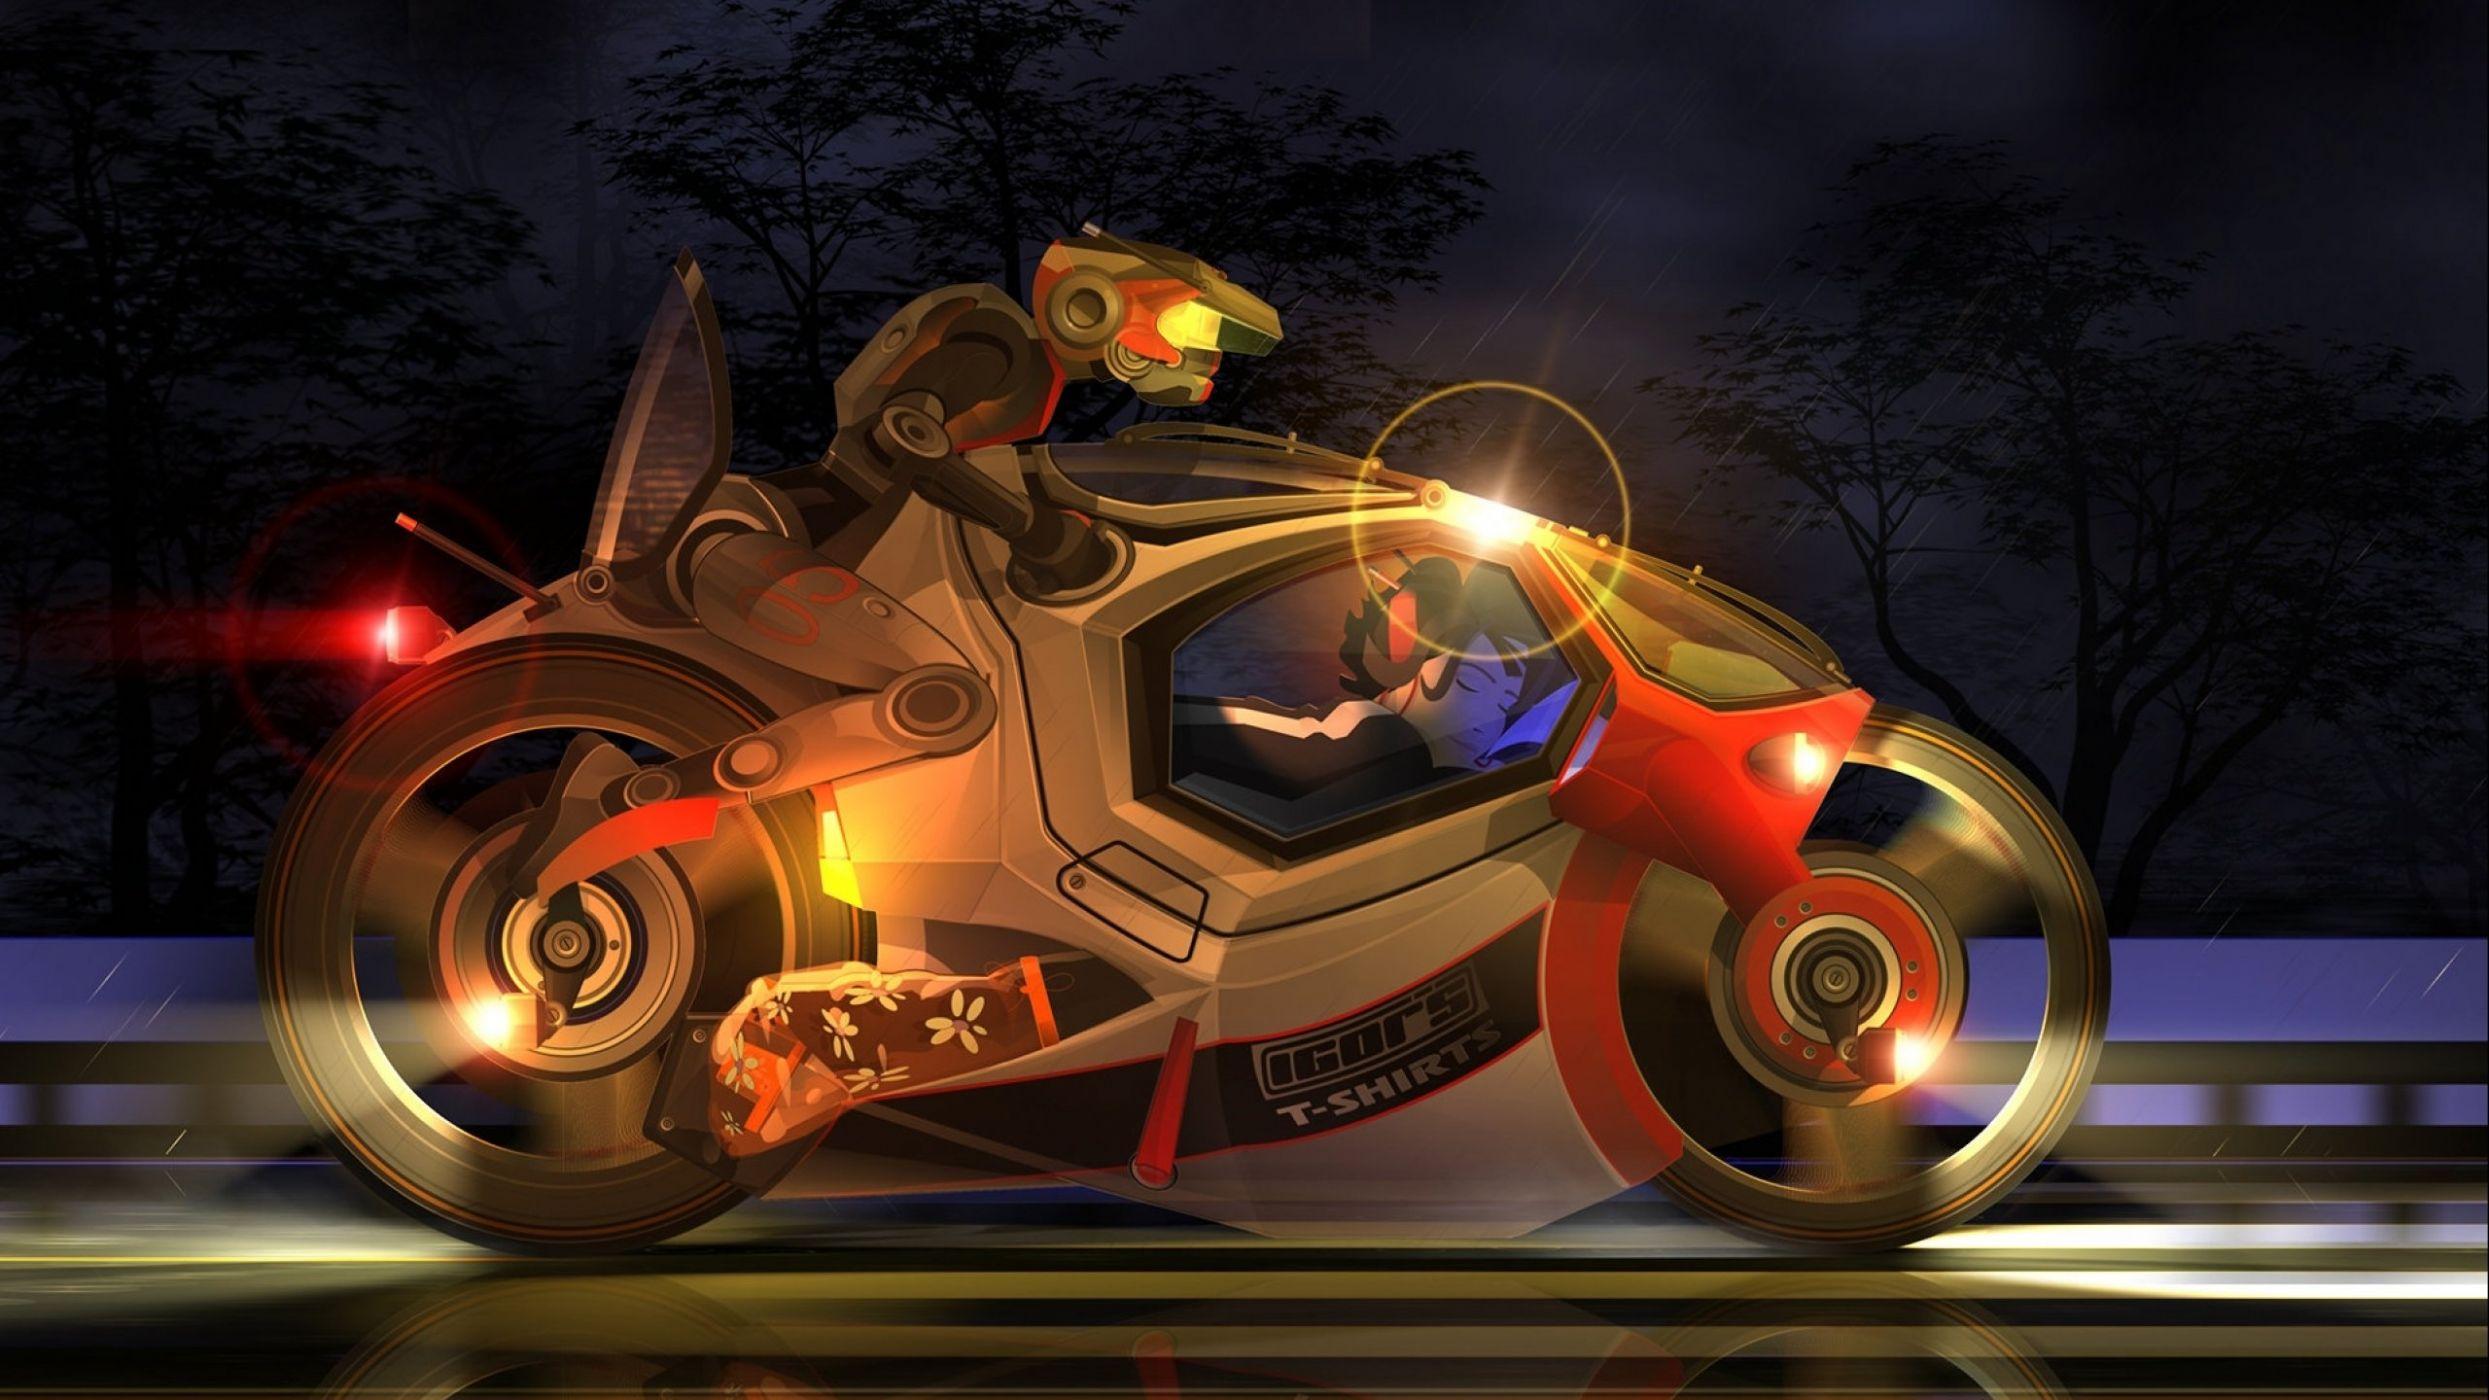 будем робот на мотоцикле картинки представлено среди